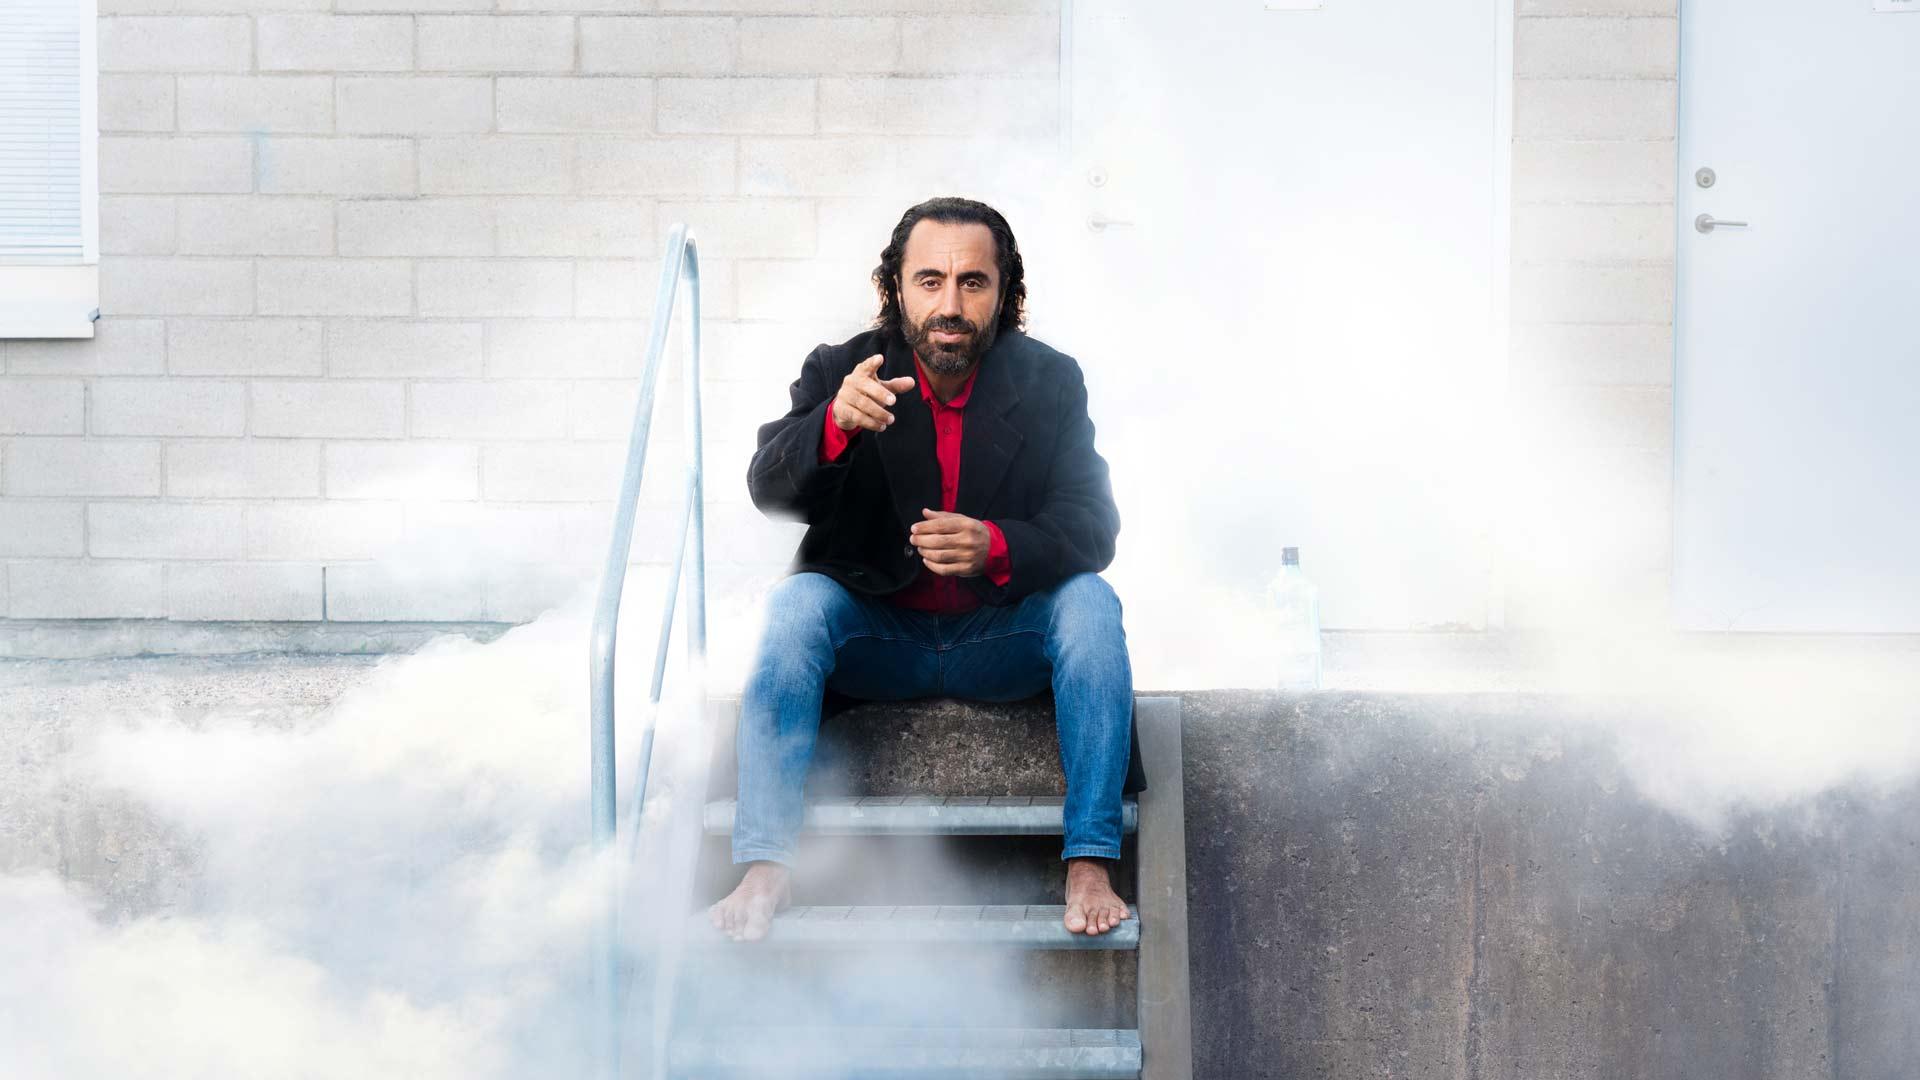 Özz Nûjen sitter på en metalltrapa omgiven av vit rök